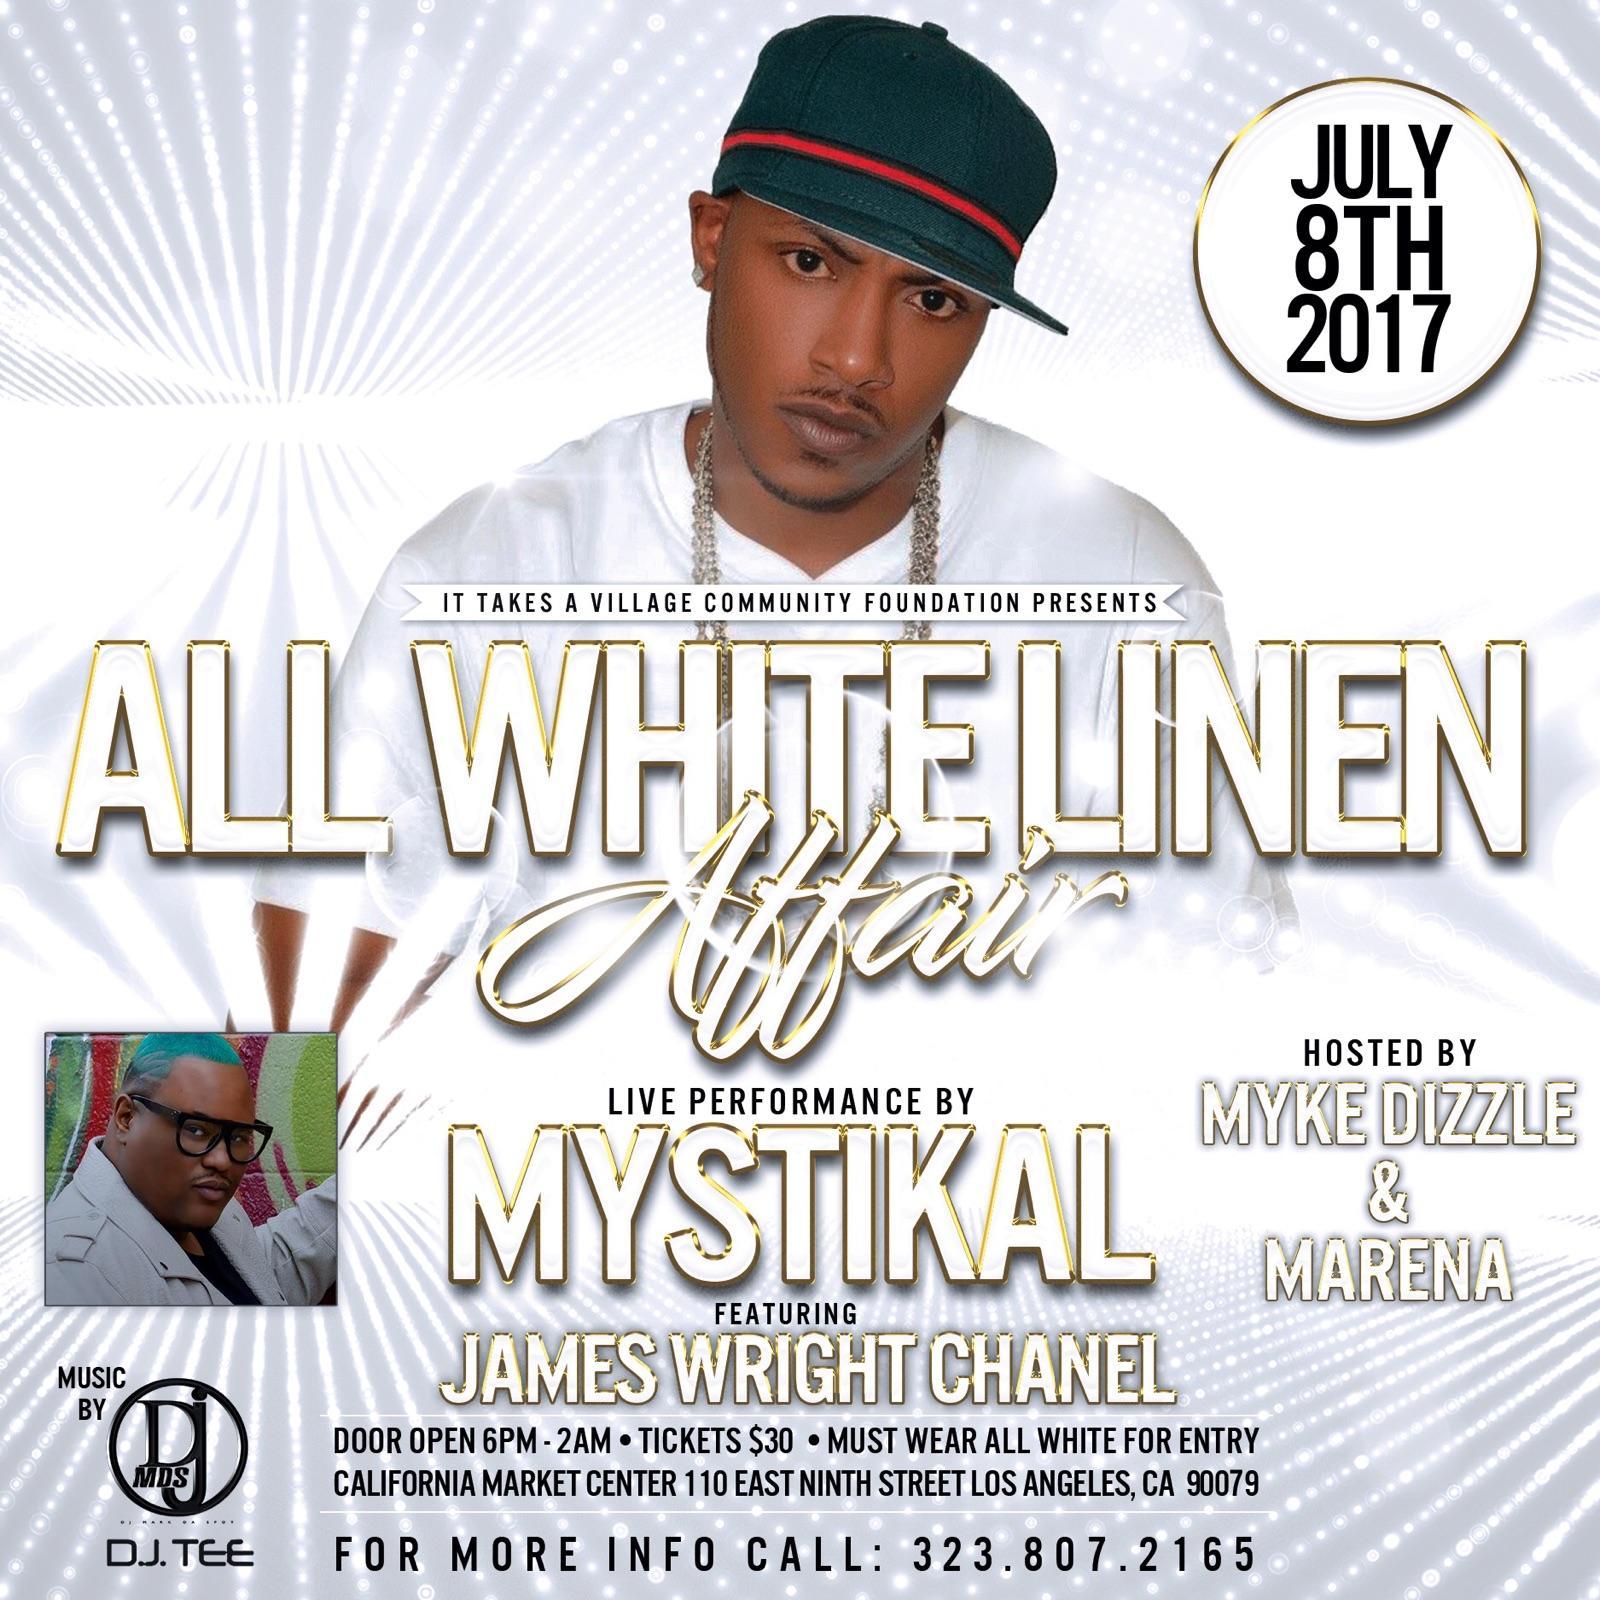 An All White Linen Affair - Live Performance